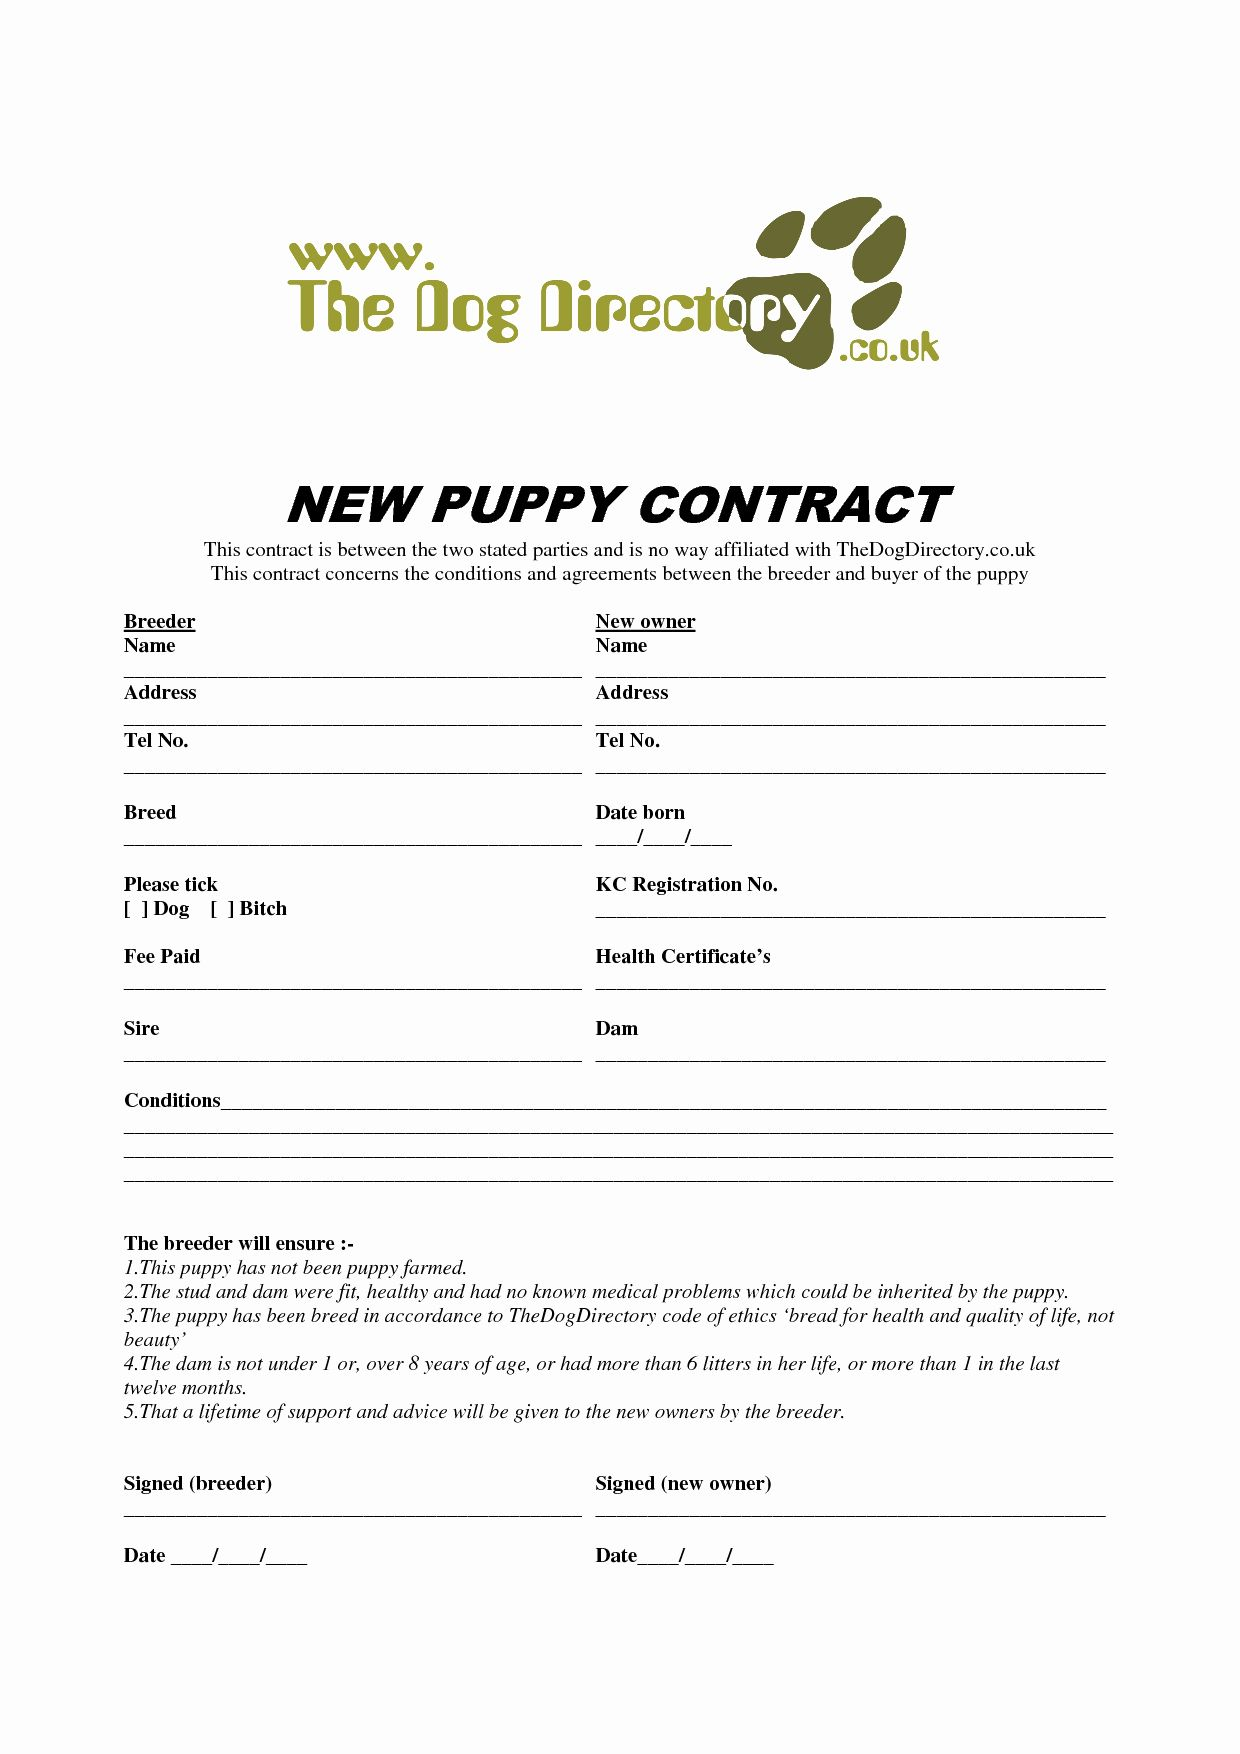 50 unique puppy health guarantee contract template in 2020